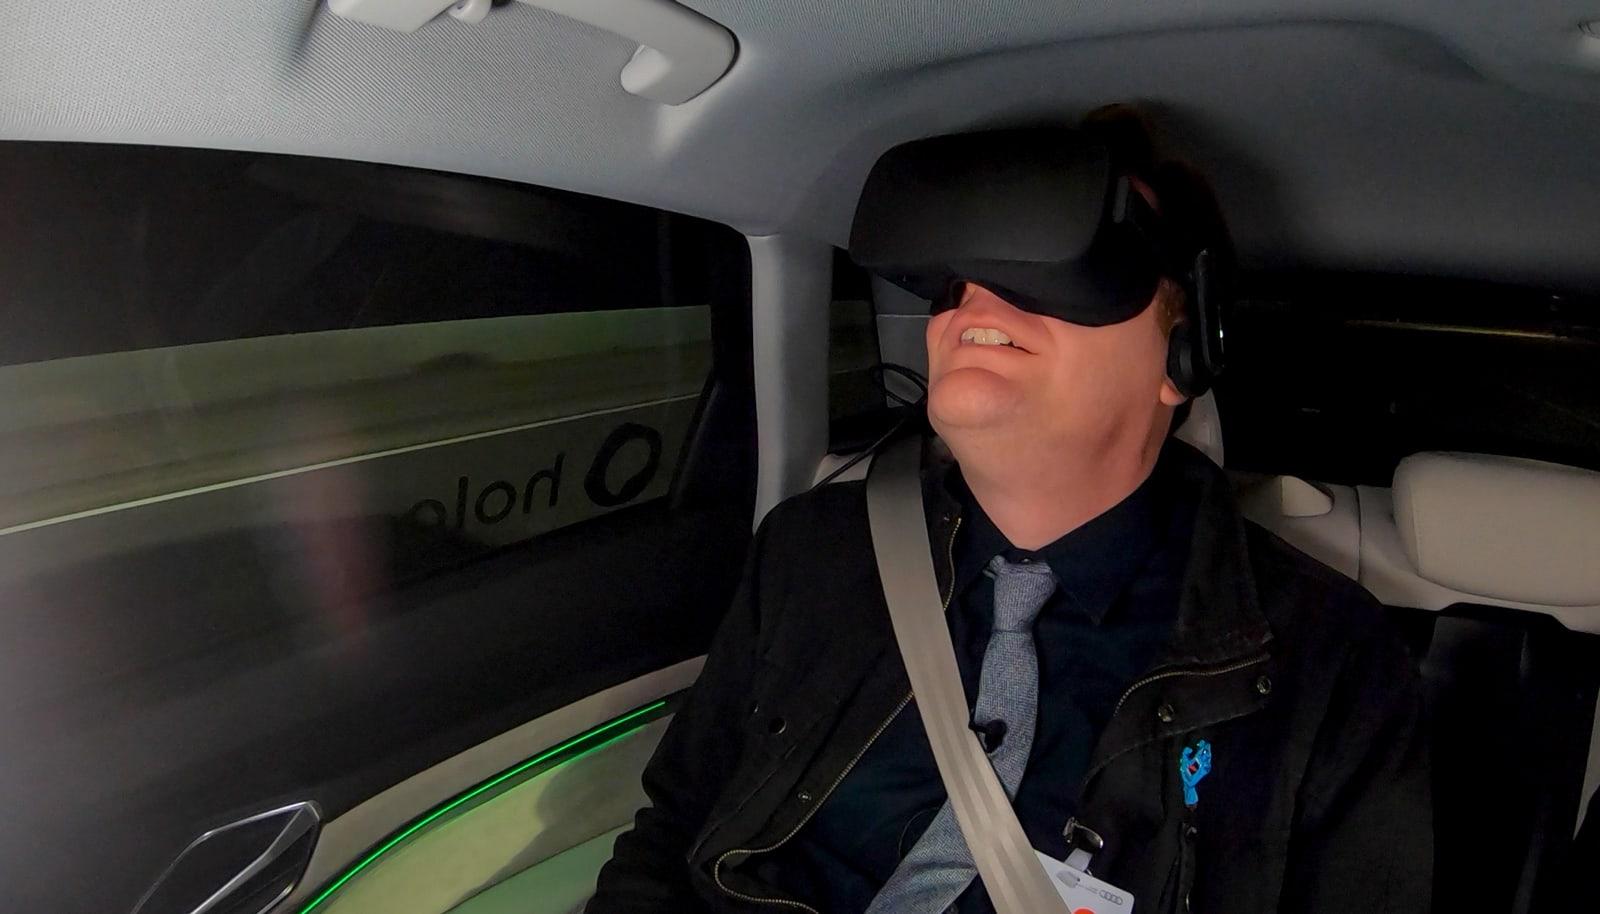 Audi / Holoride VR